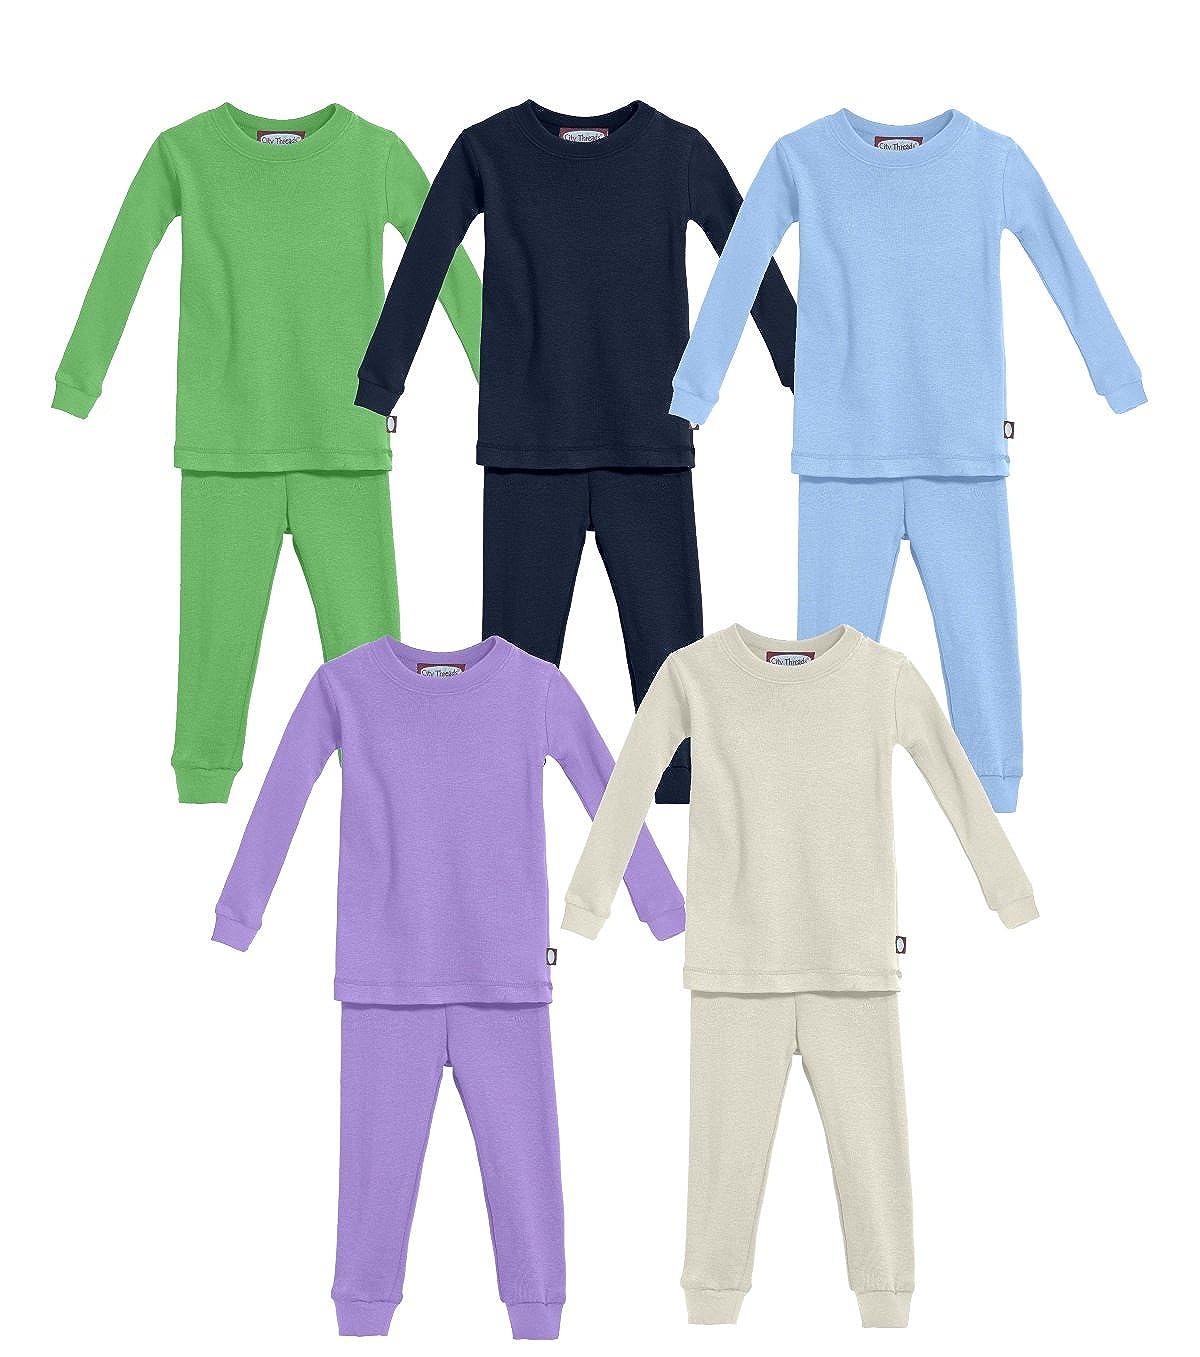 City Threads Boys Girls Pajama Set PJS Organic Cotton Made in USA